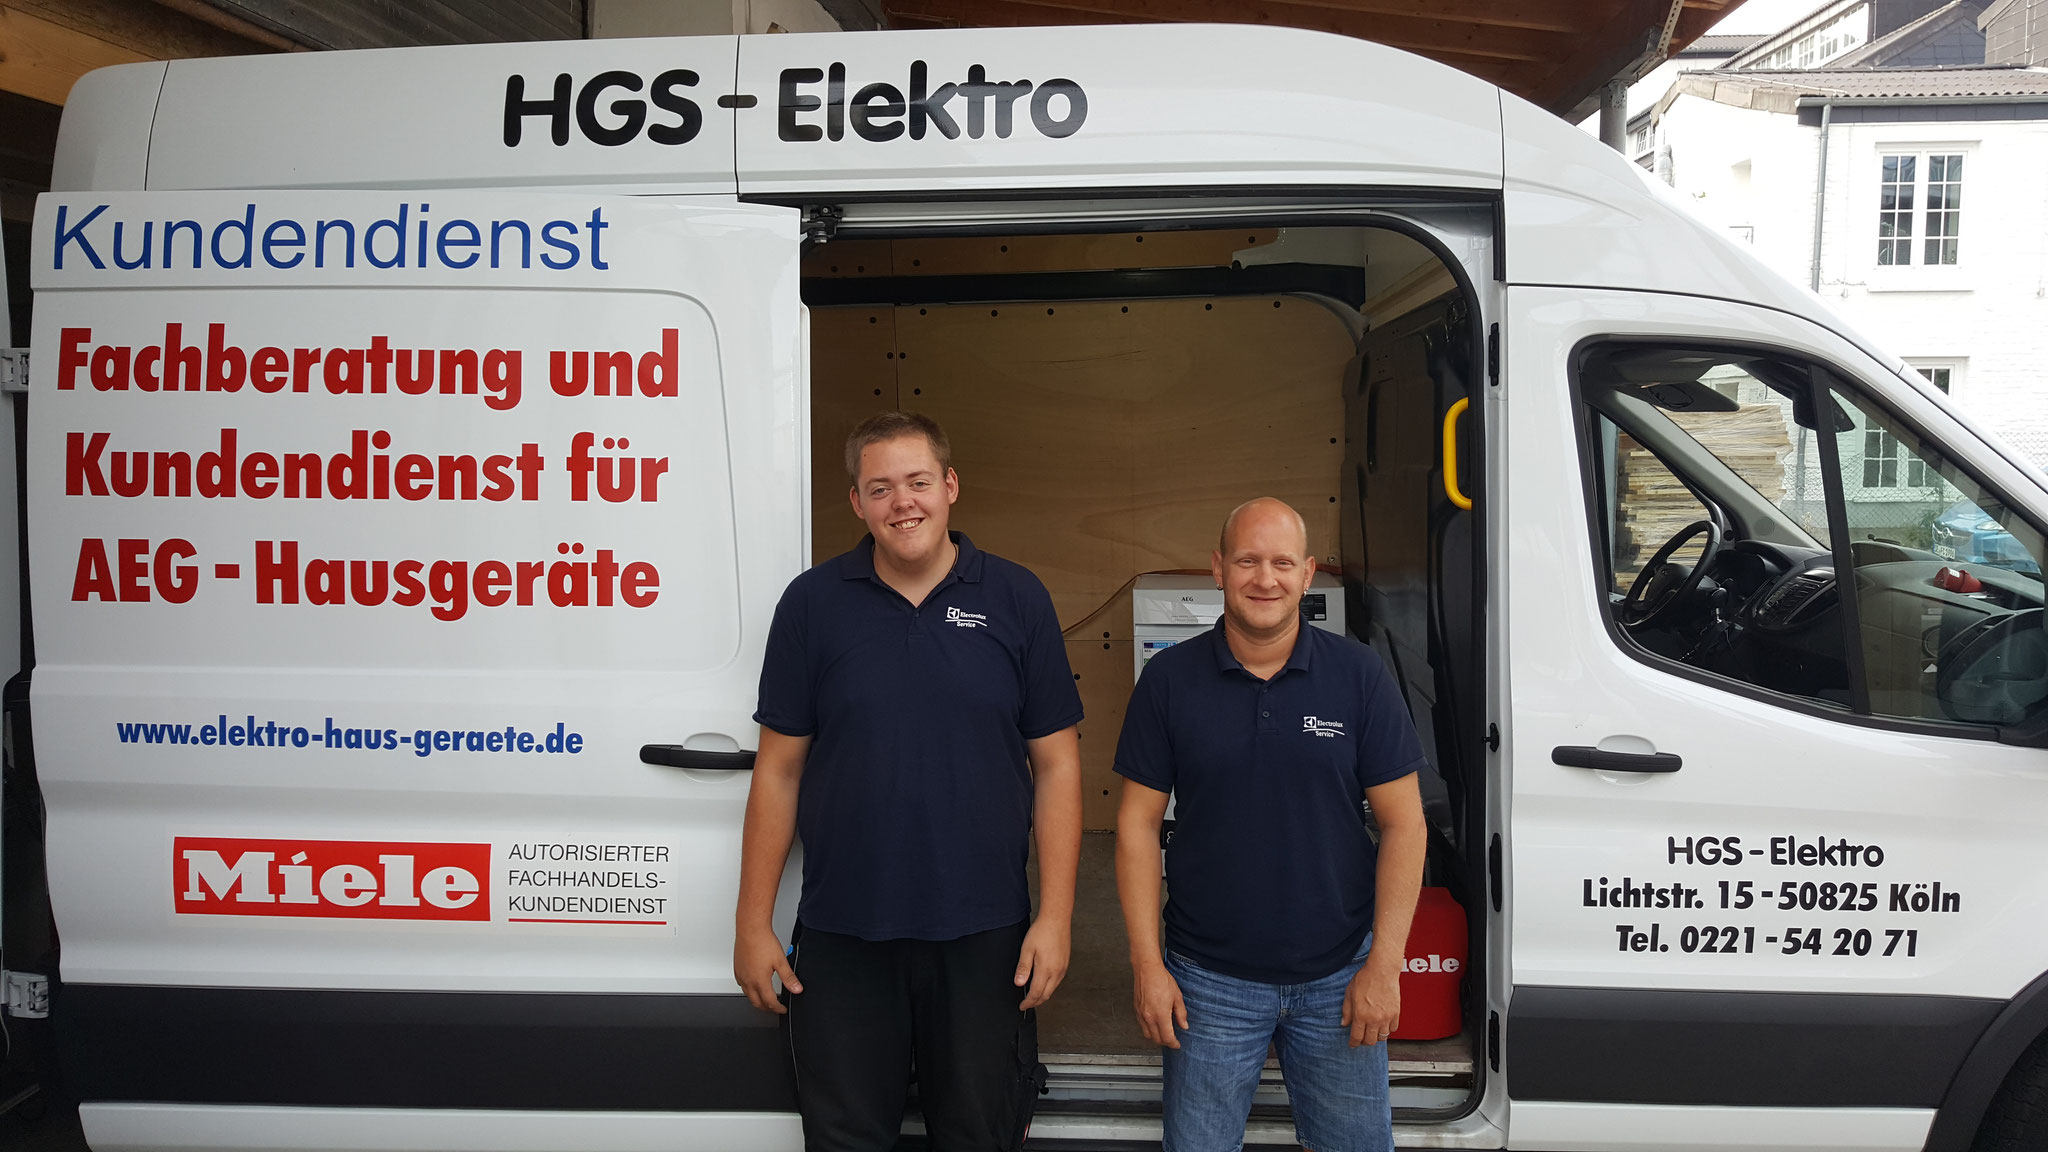 HGS Elektro Neff Kundendienst in Köln